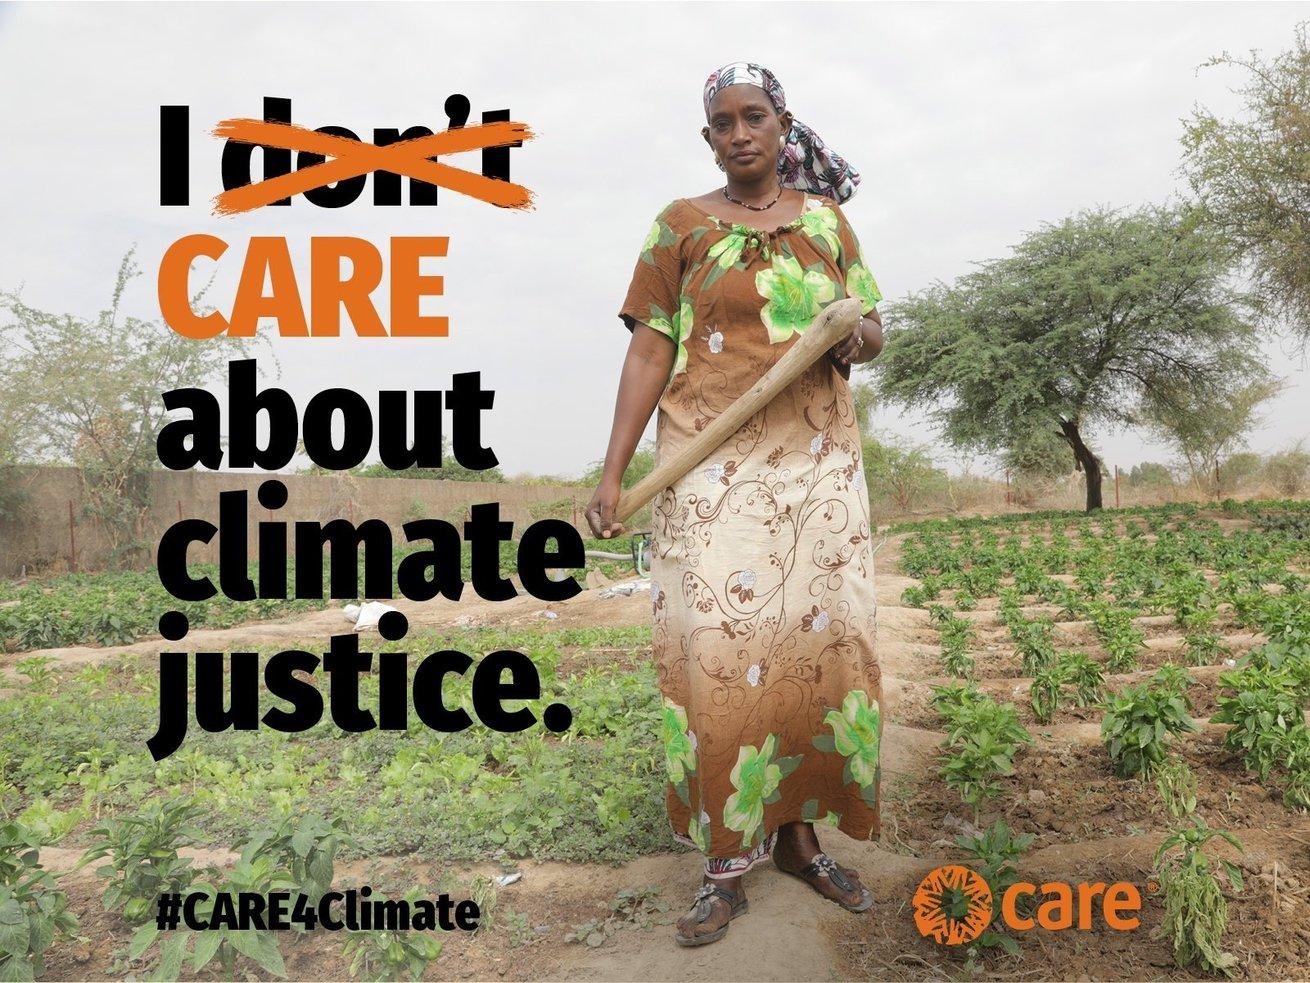 CARE Climate Justice